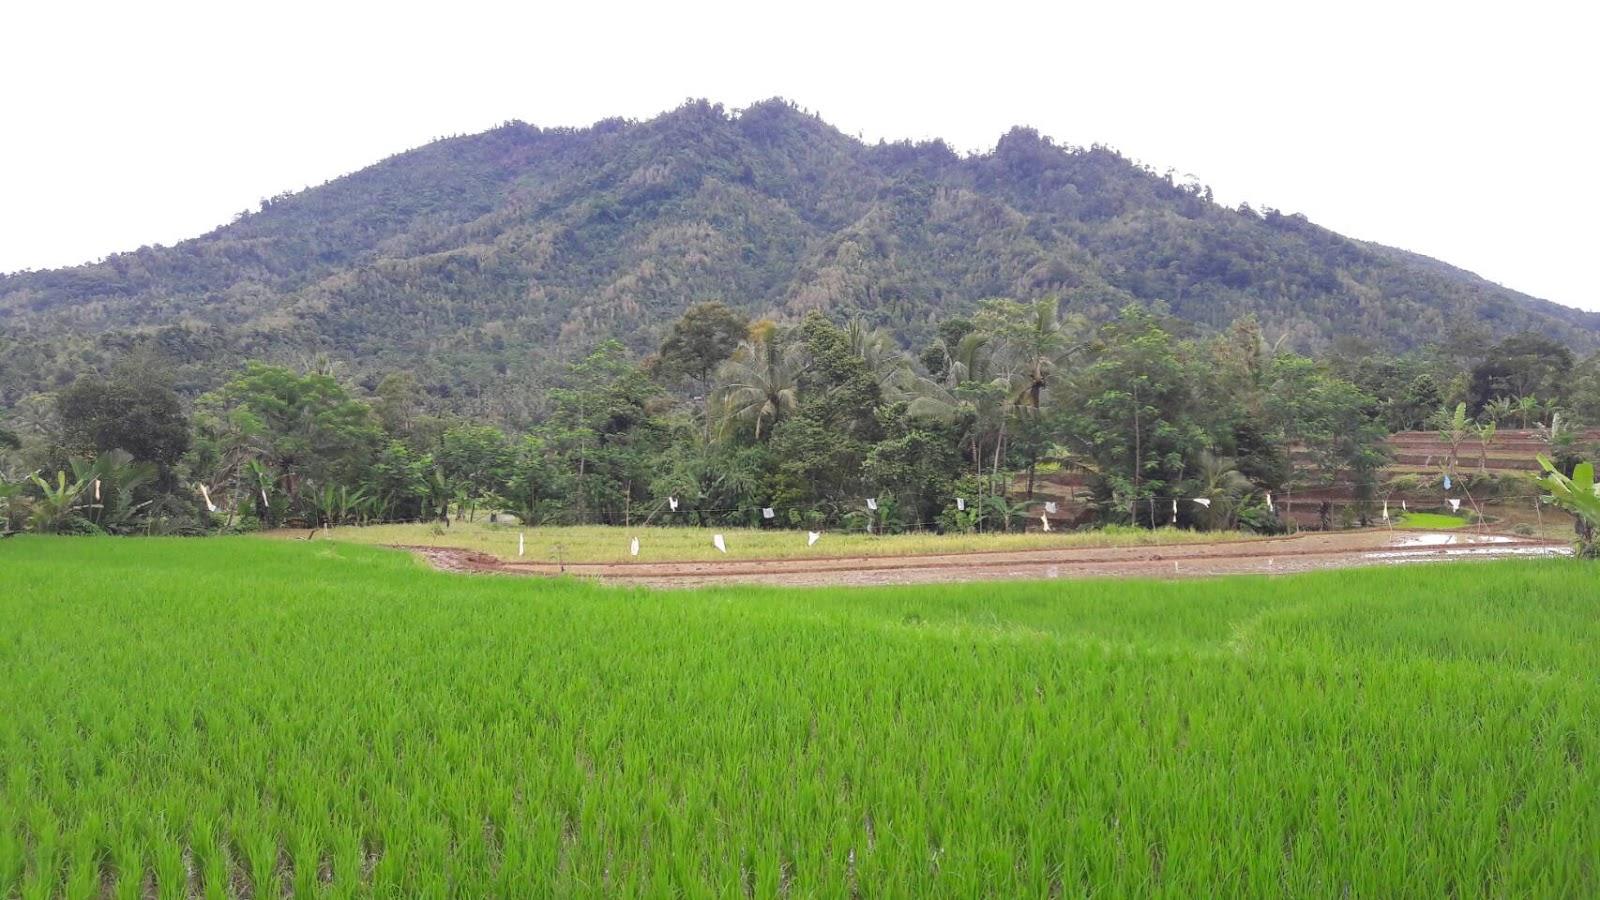 Desa Ujung Tebu Kecamatan Ciomas Kabupaten Serang